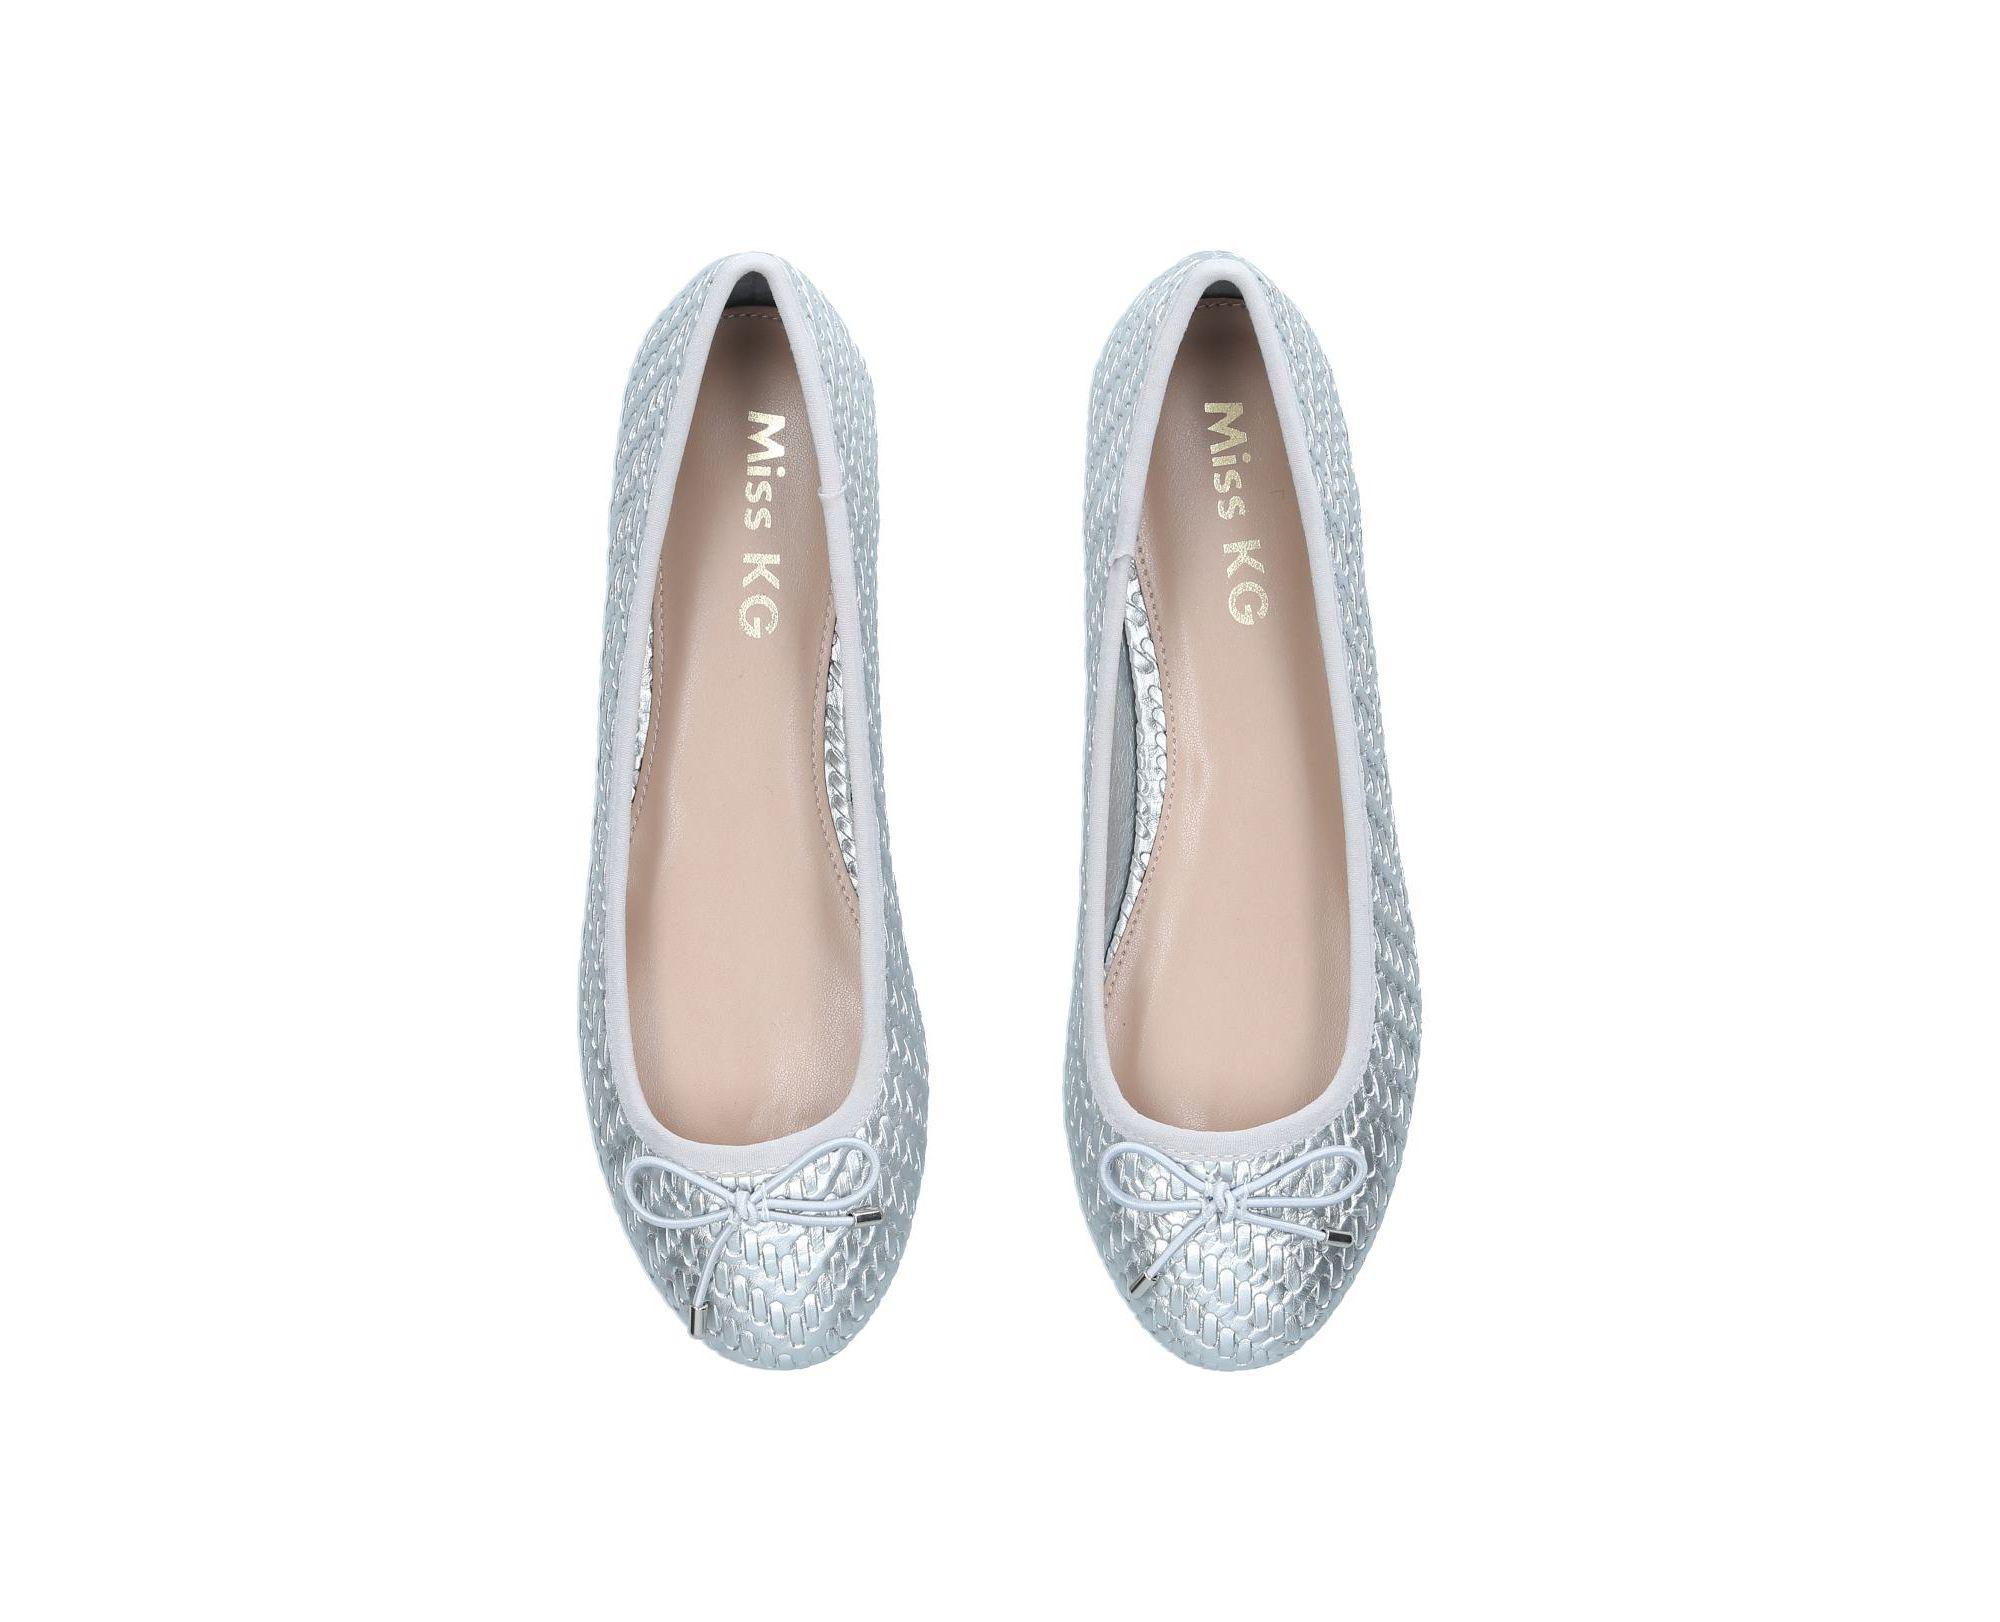 c2c4e4e5c Miss Kg - Metallic Silver  nellie  Flat Ballerina Shoes - Lyst. View  fullscreen